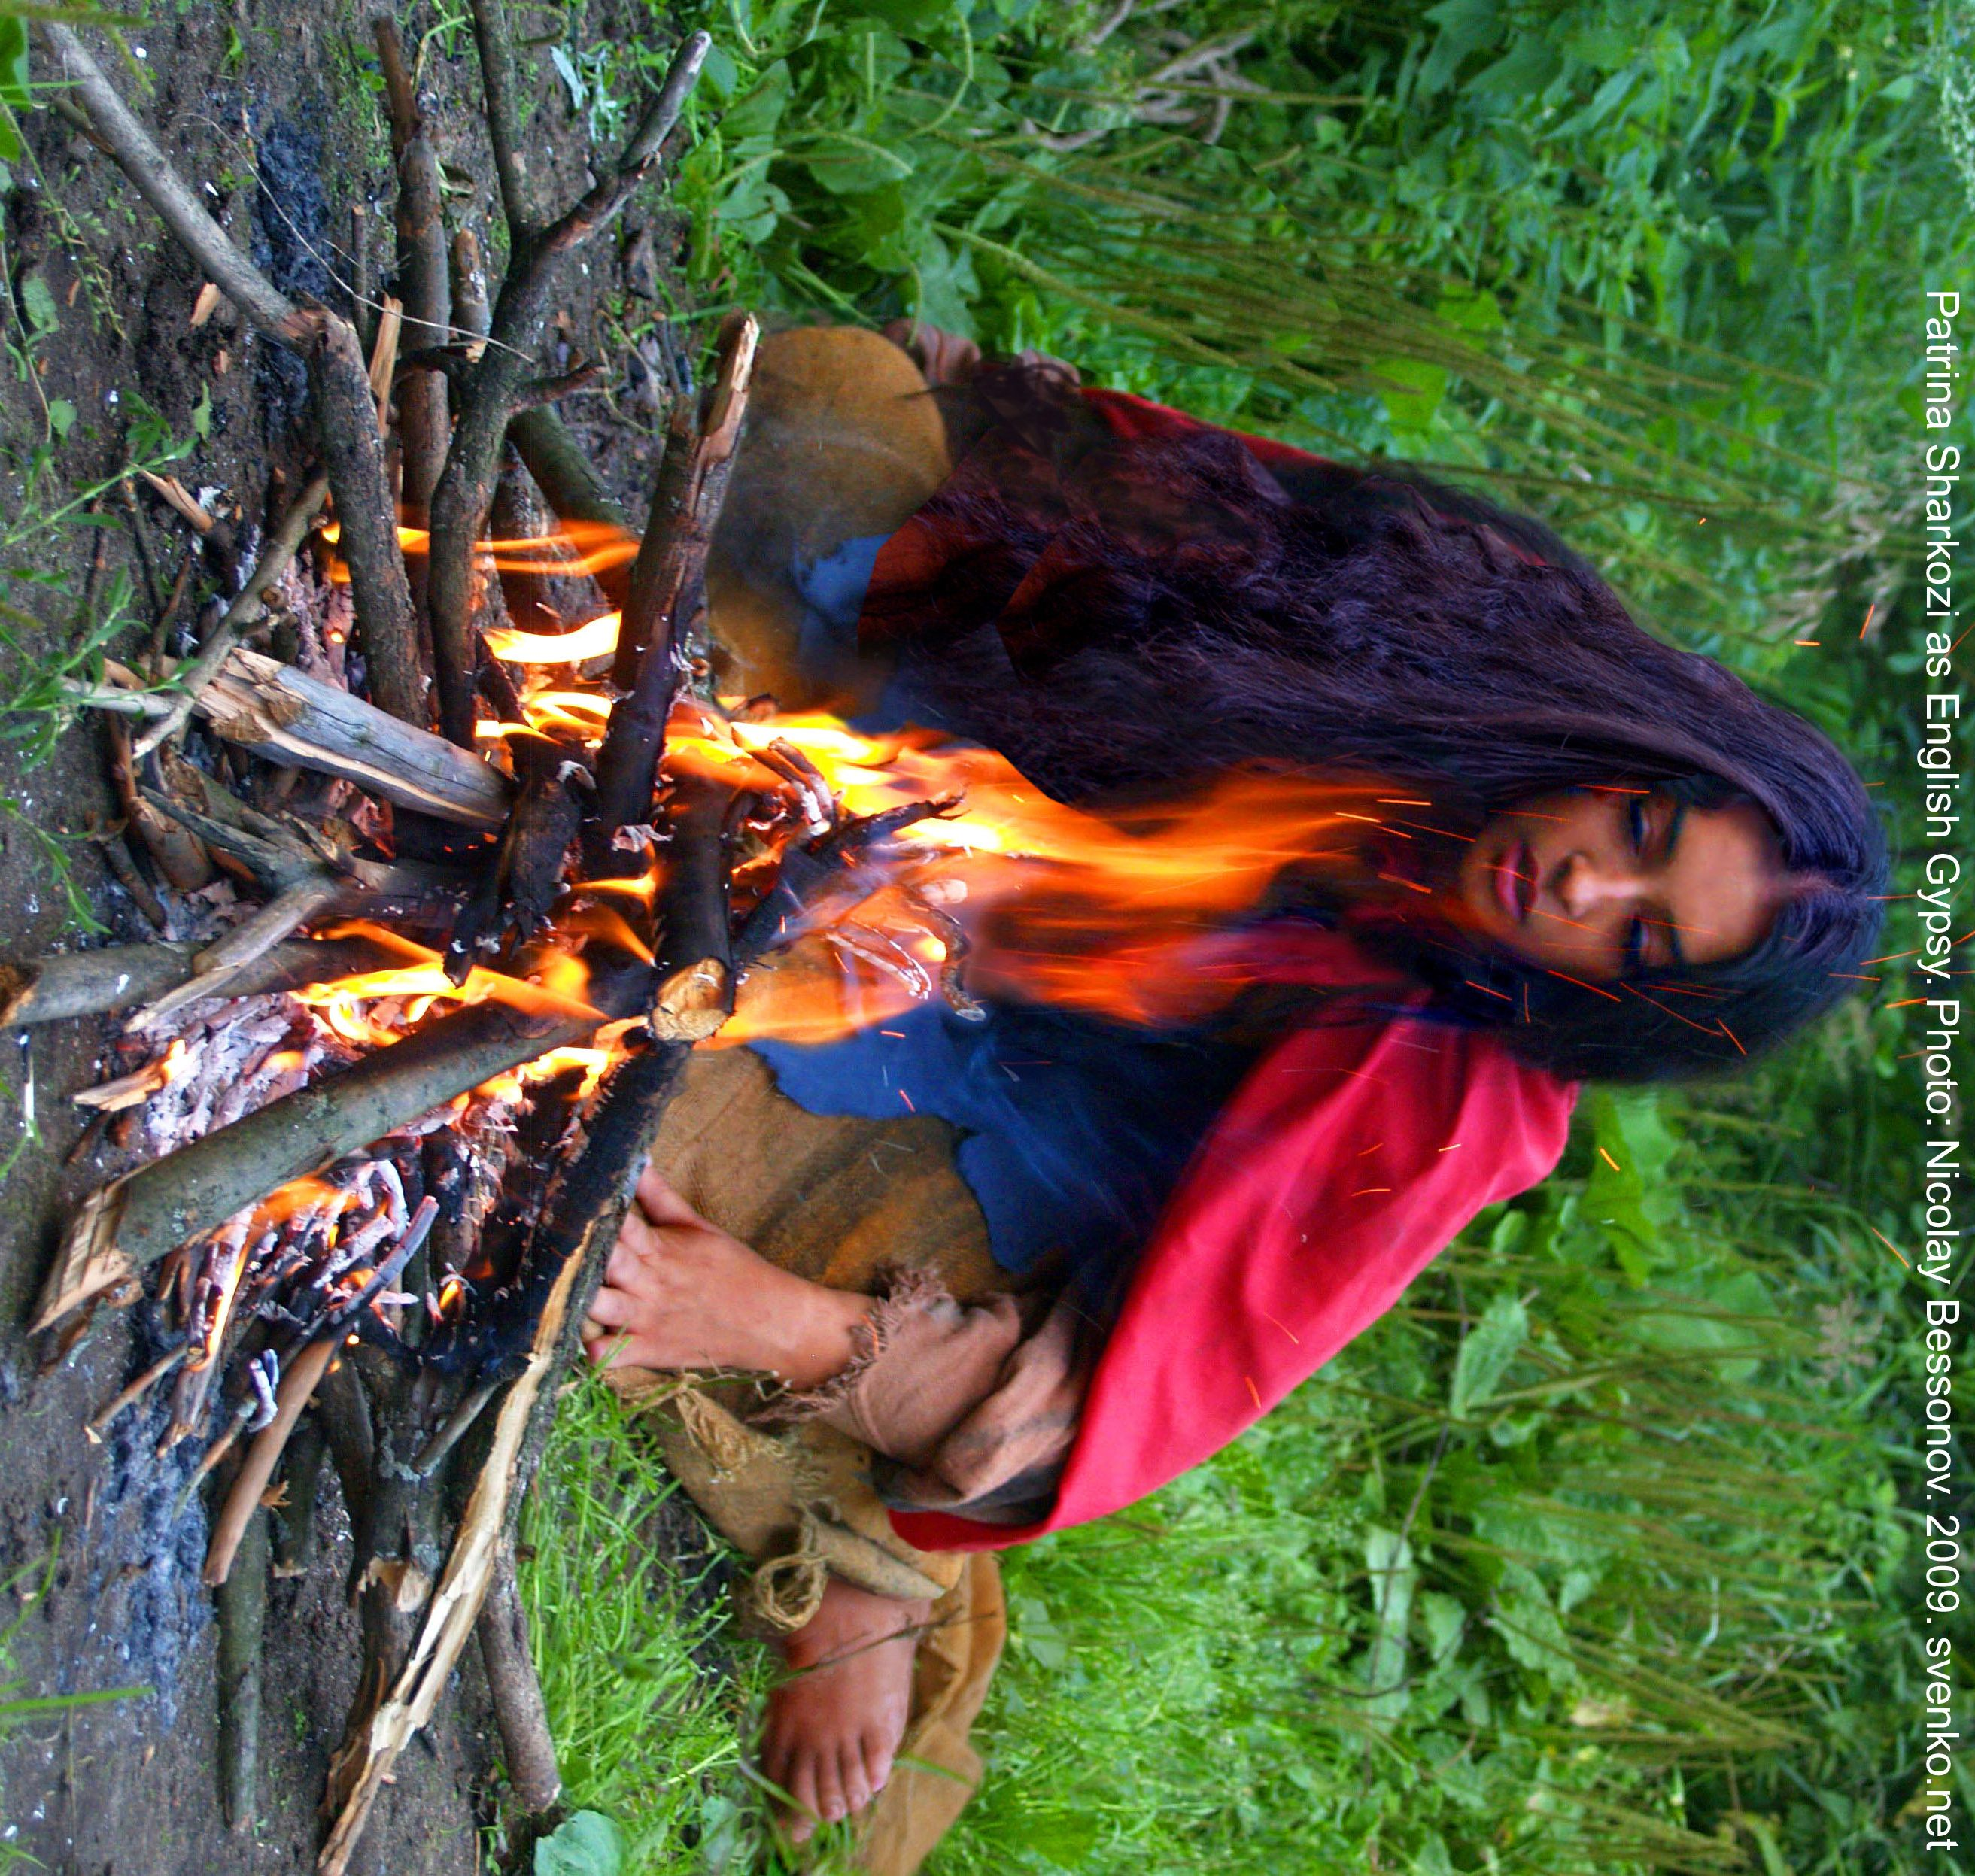 american gypsy girl nude